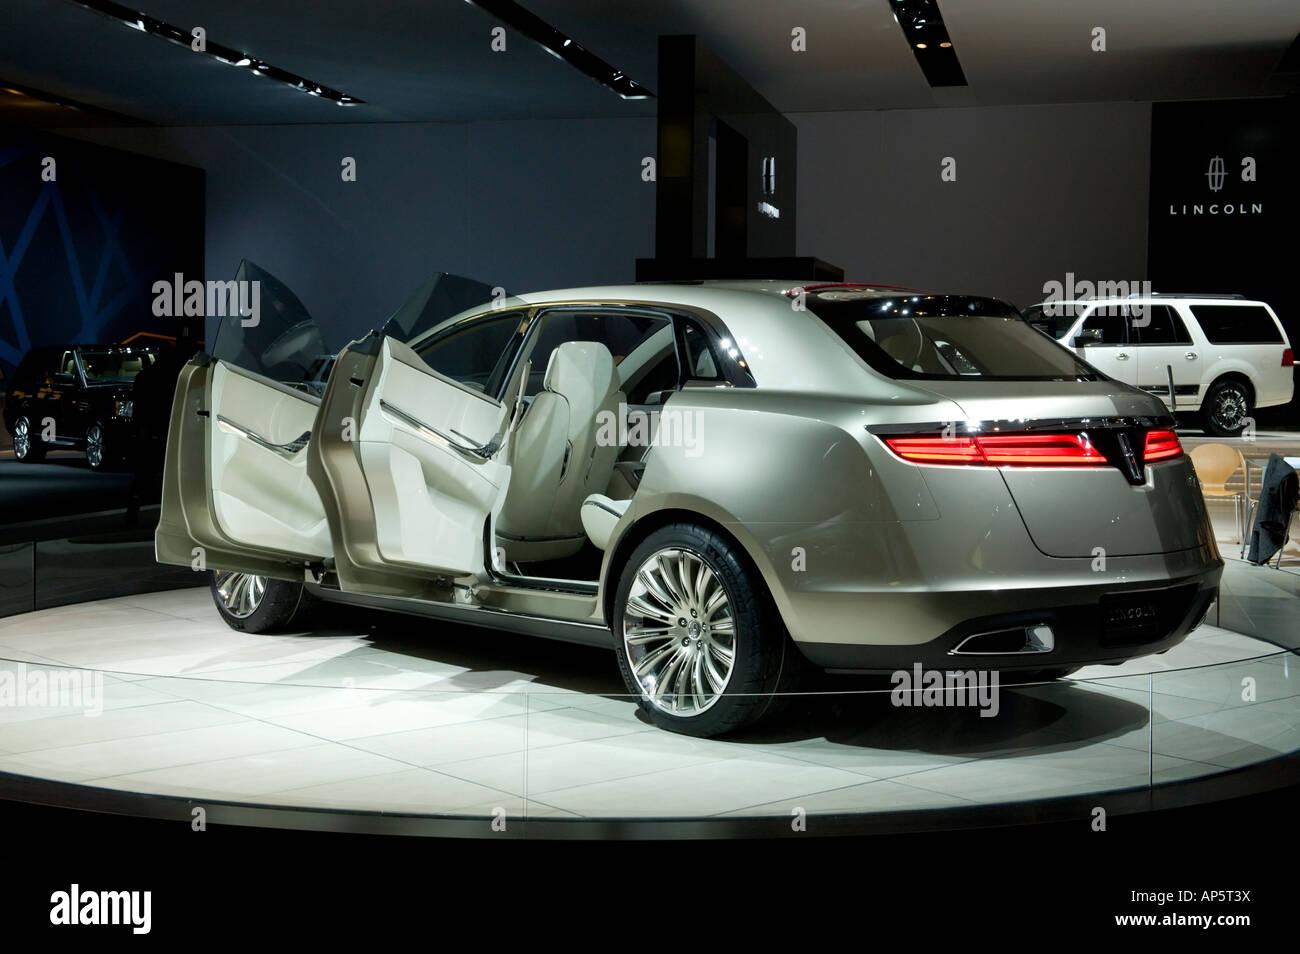 https://c7.alamy.com/comp/AP5T3X/lincoln-mkt-concept-car-at-the-2008-north-american-international-auto-AP5T3X.jpg